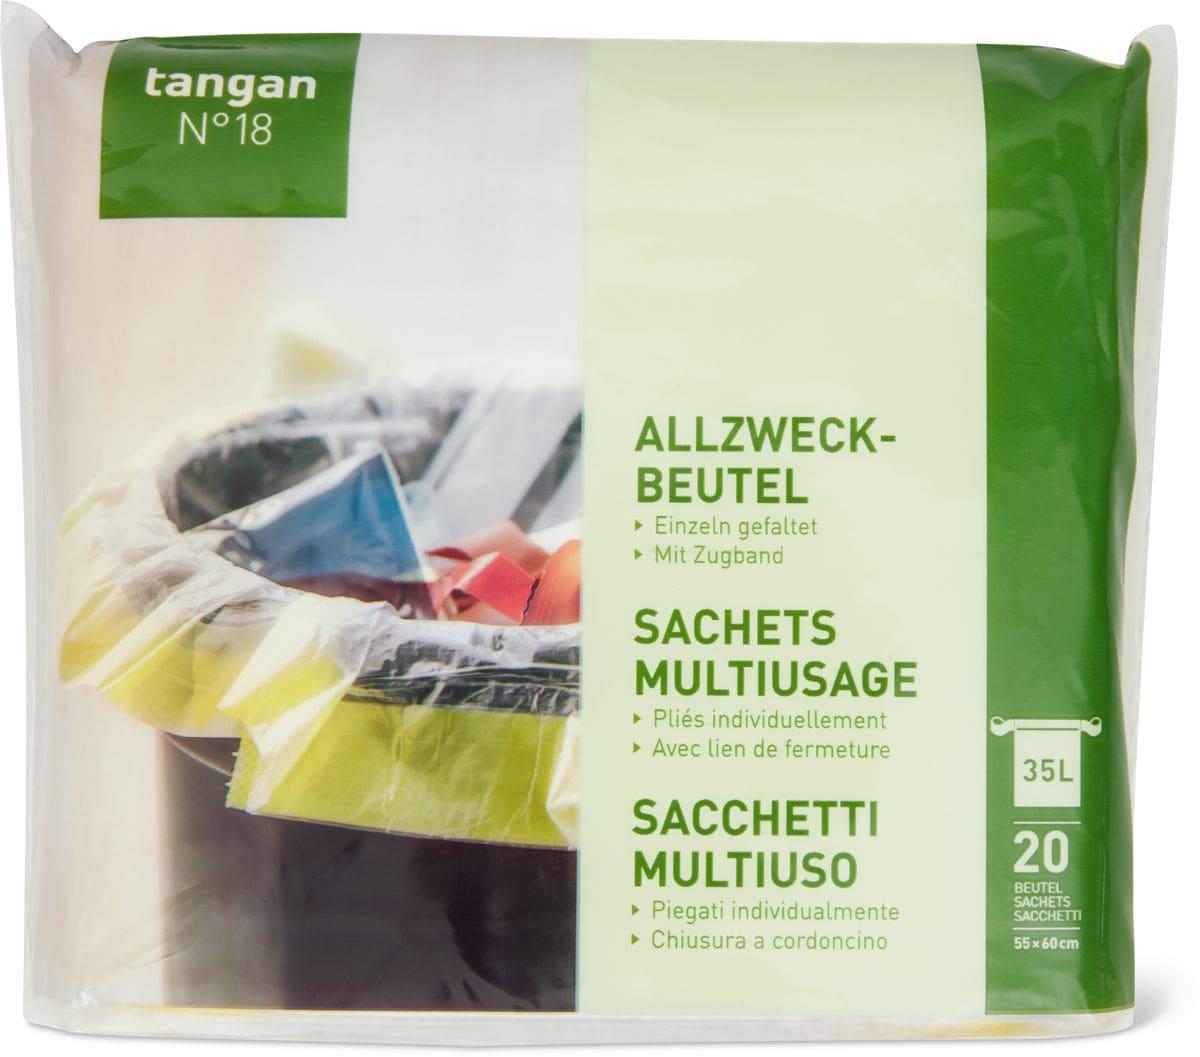 Tangan N°18 Sachets Multiusage 35l